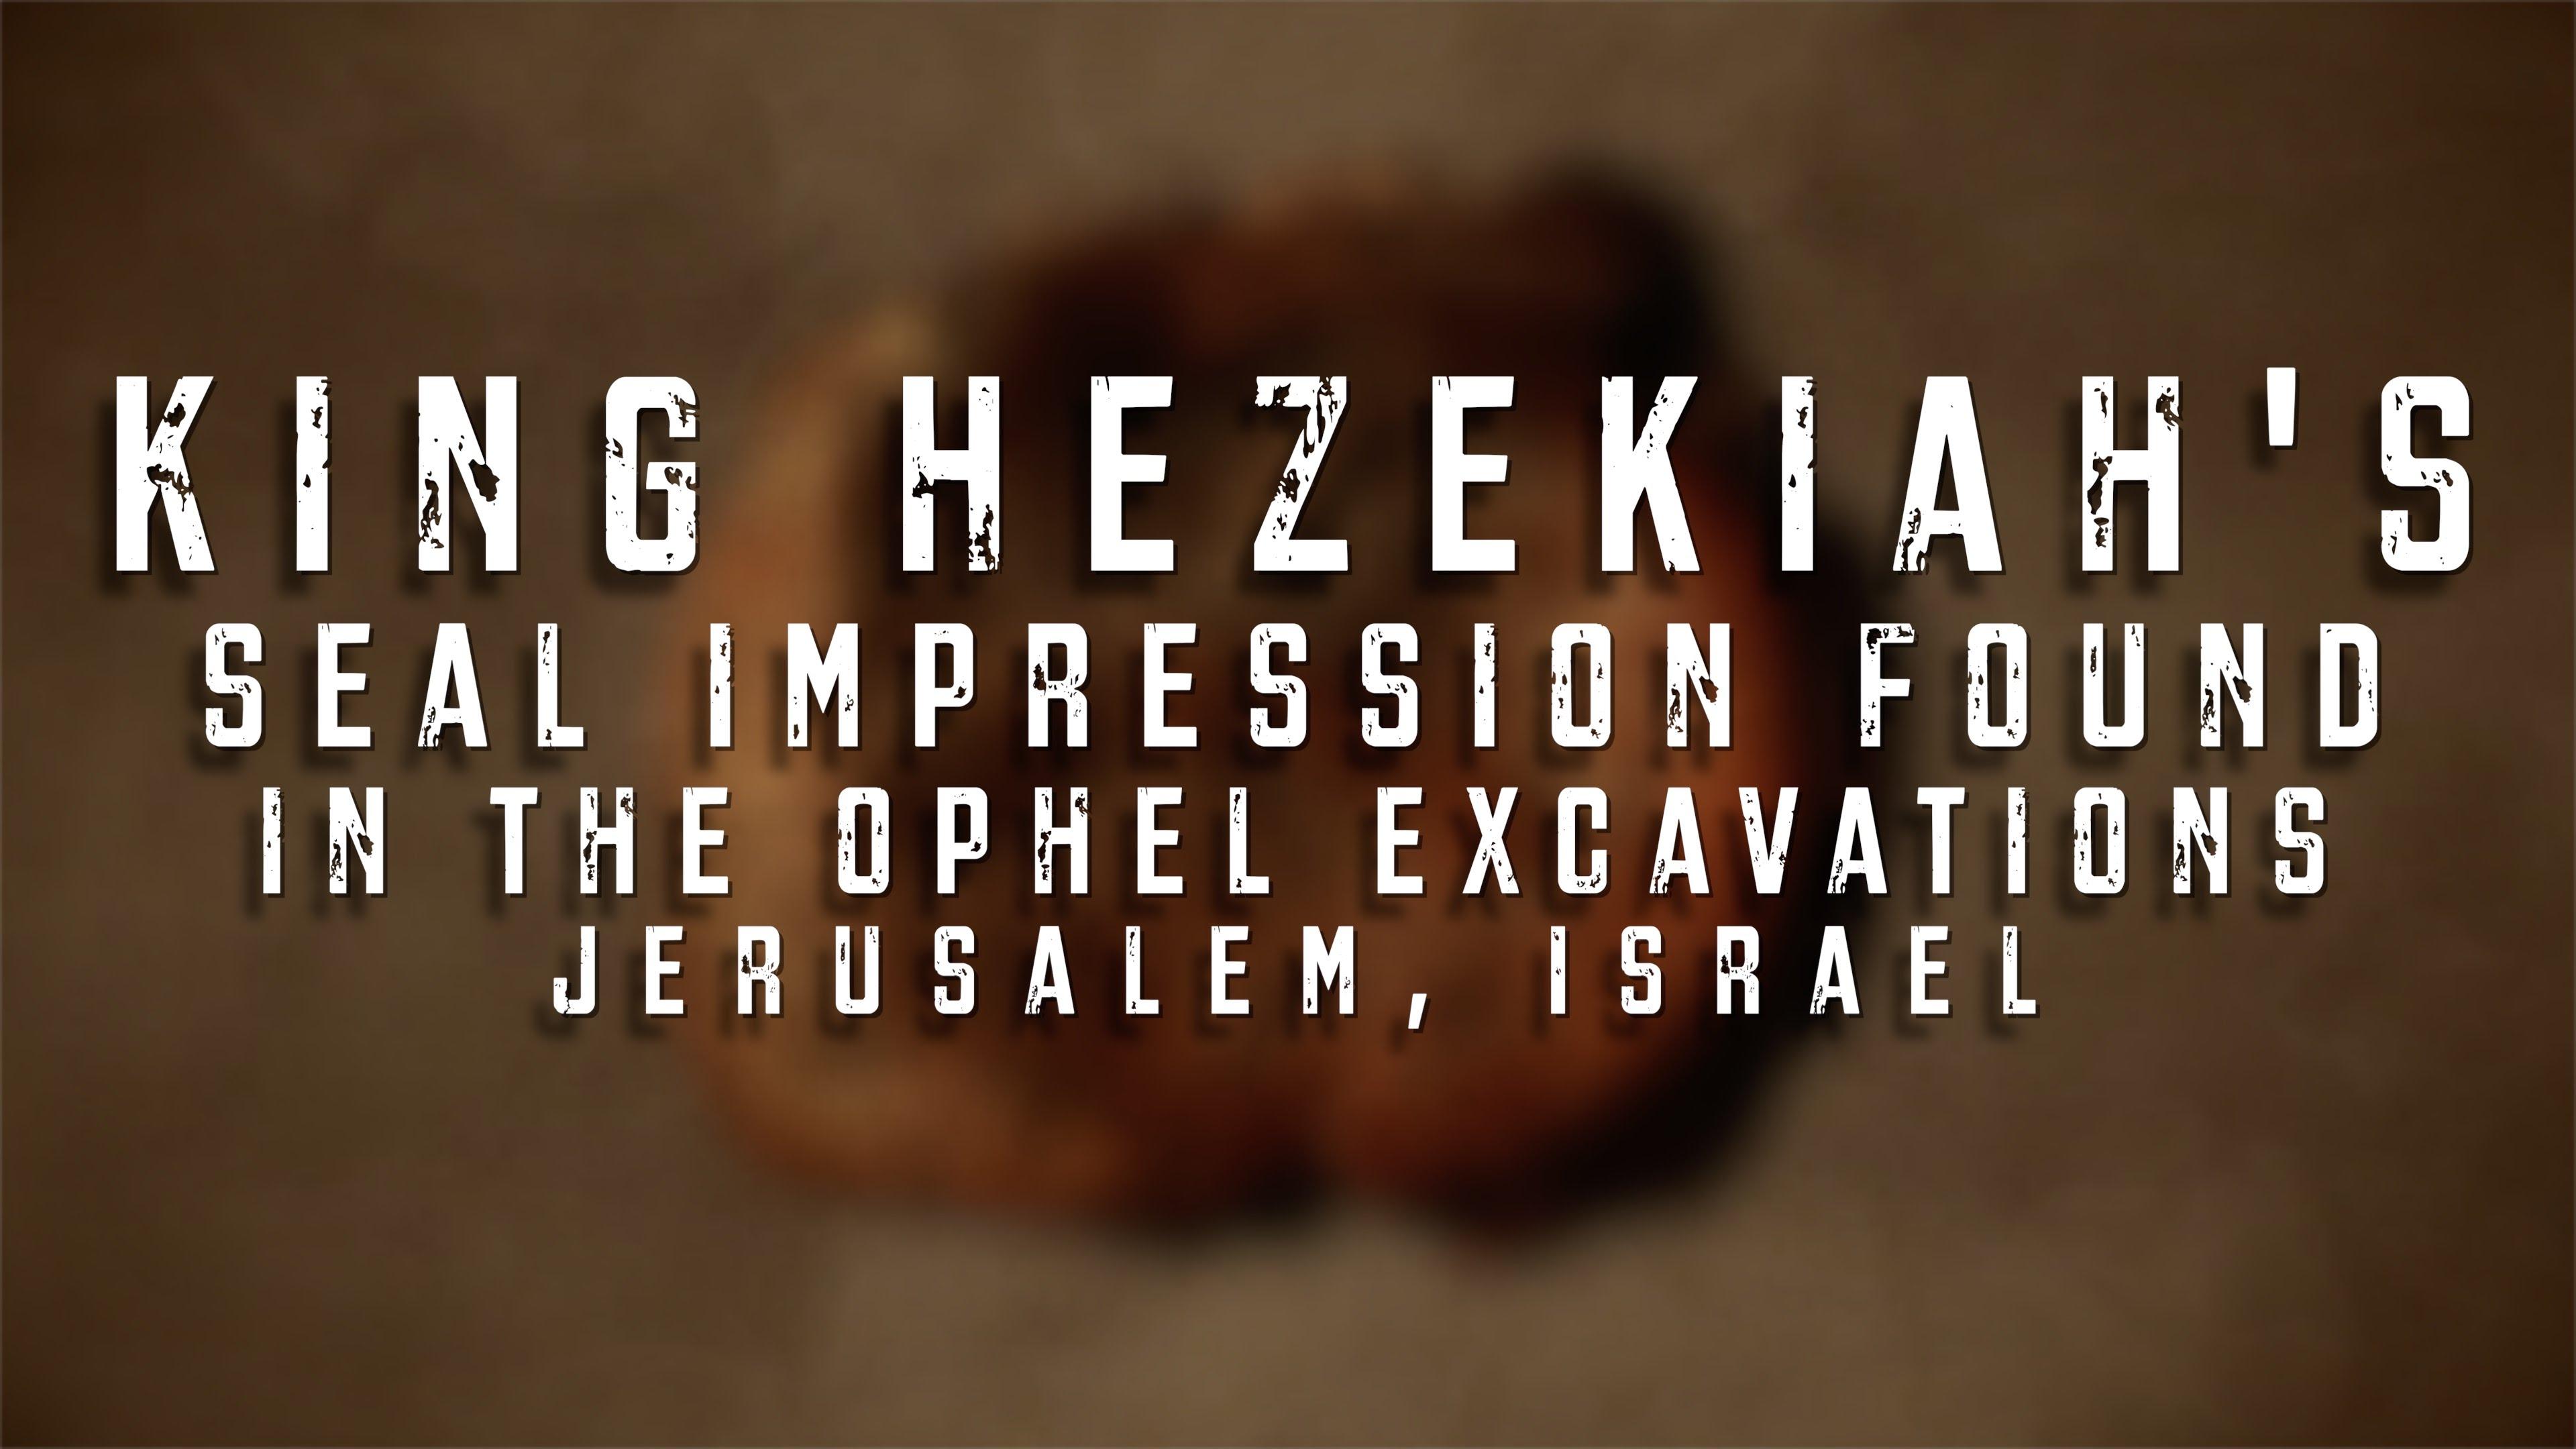 Hezekiahs seal